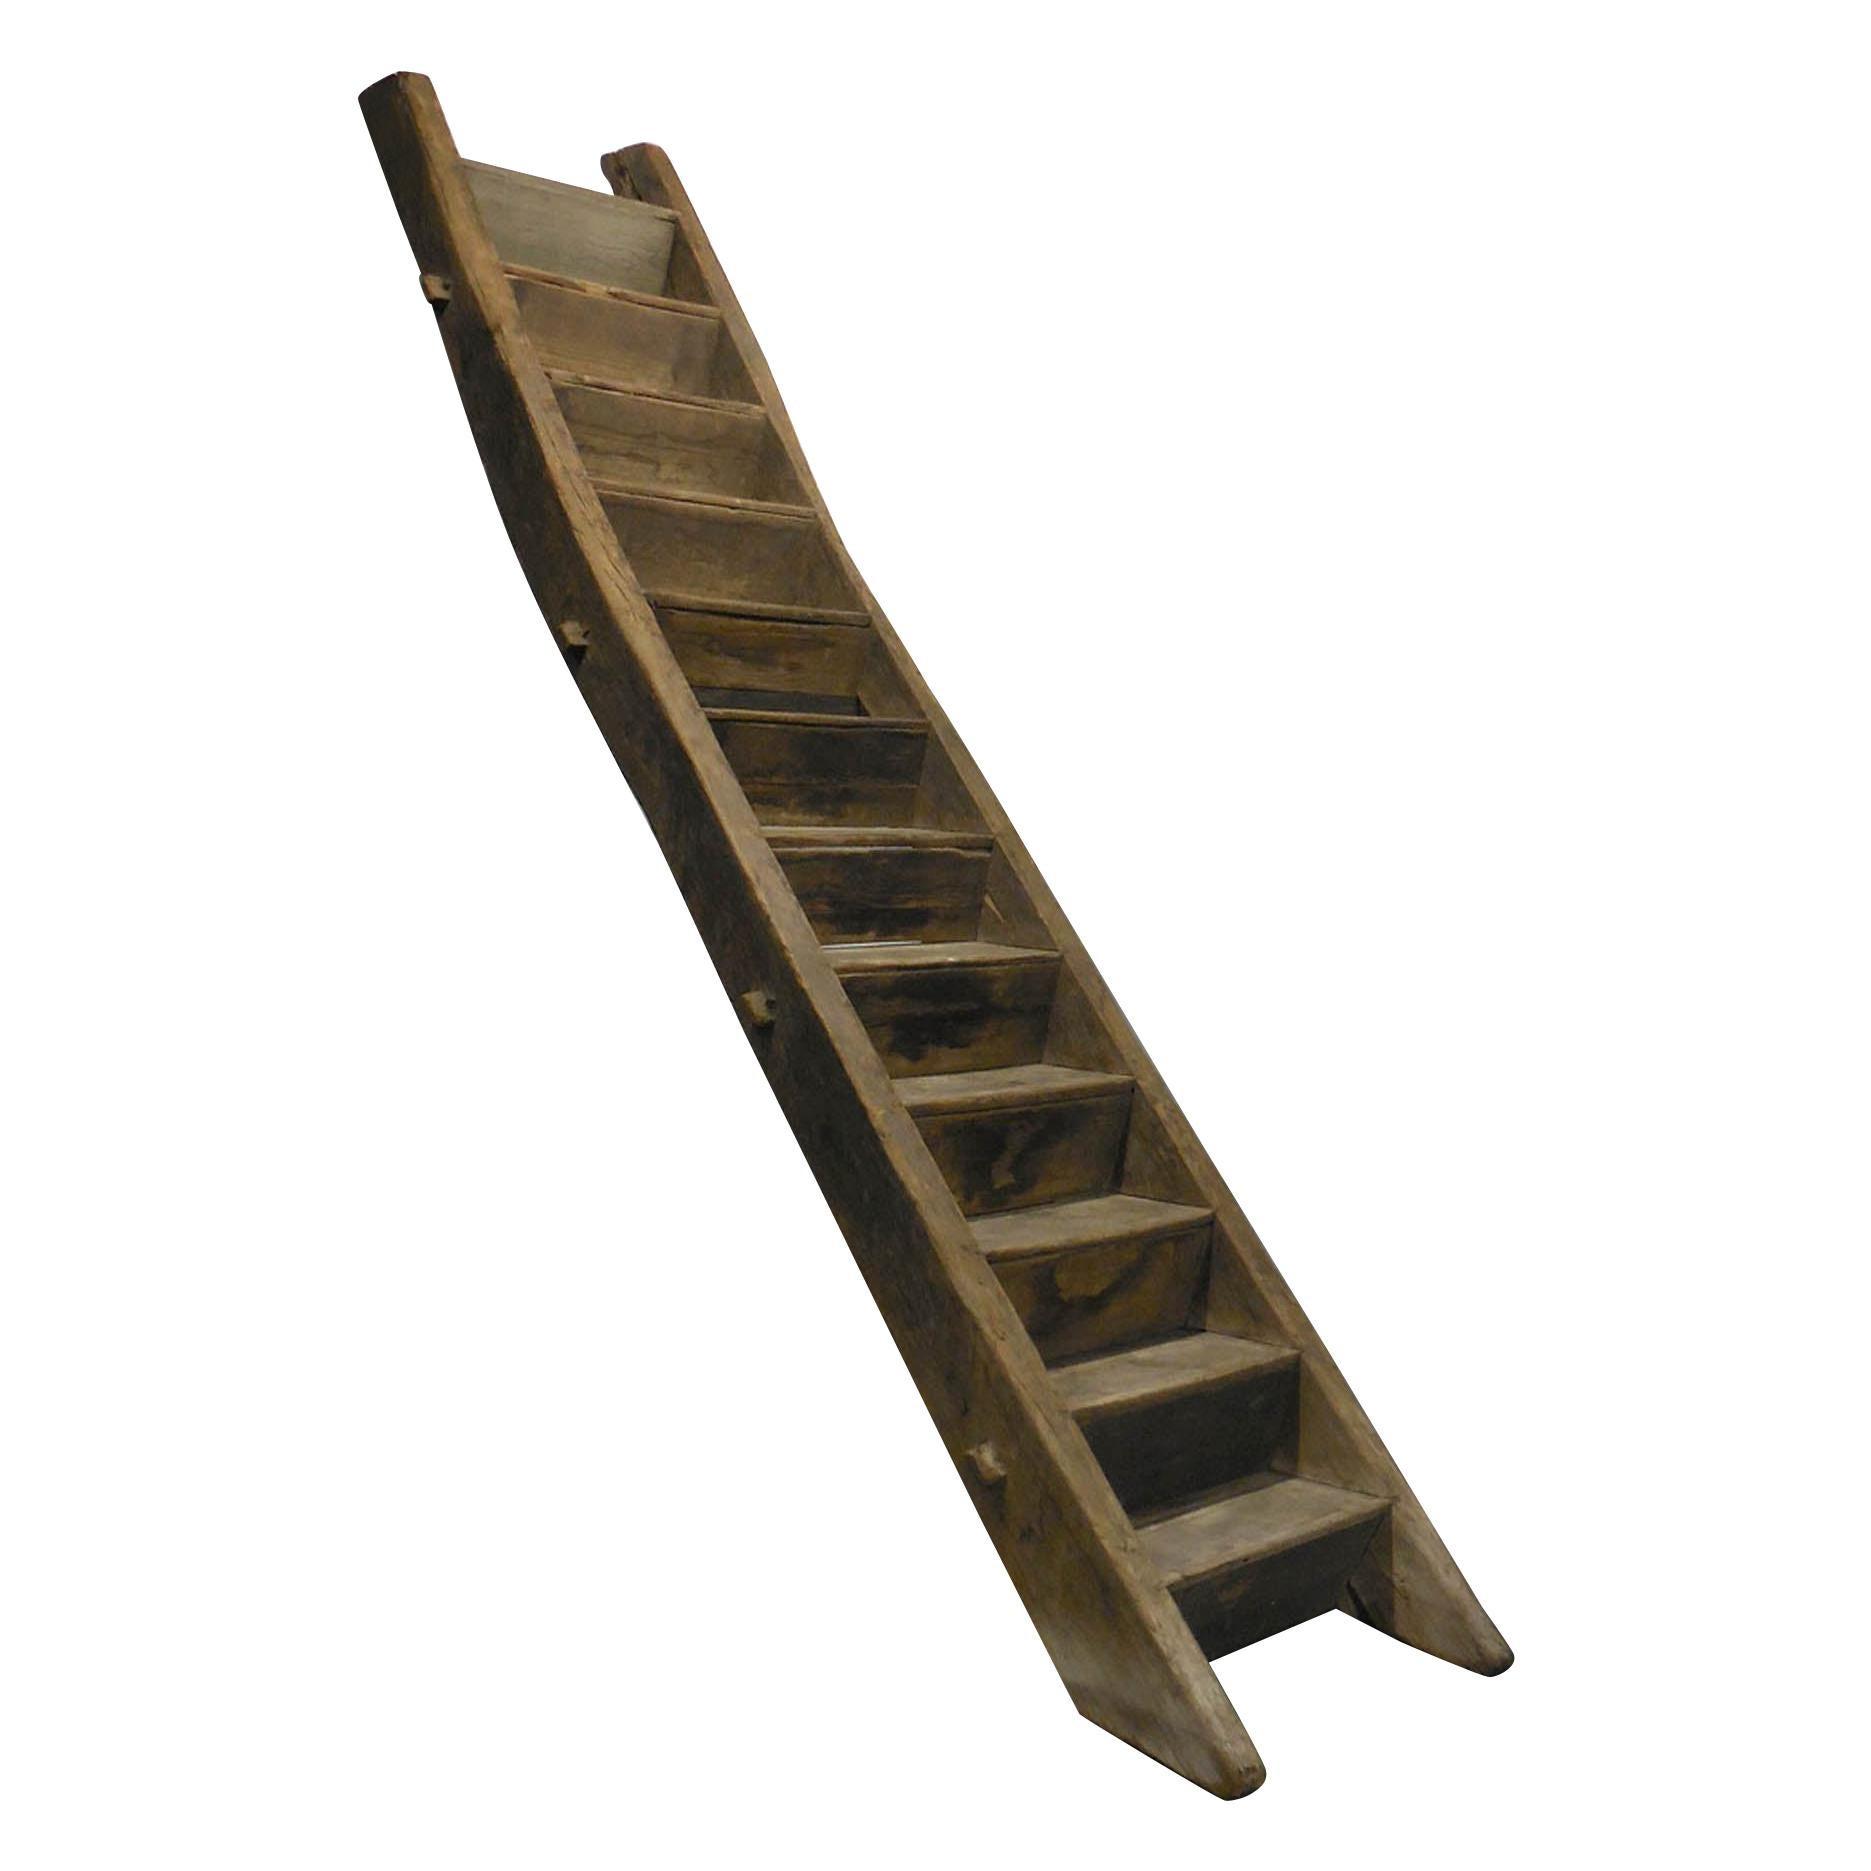 19th Century Antique Massive Elmwood Loft Ladder or Stairs